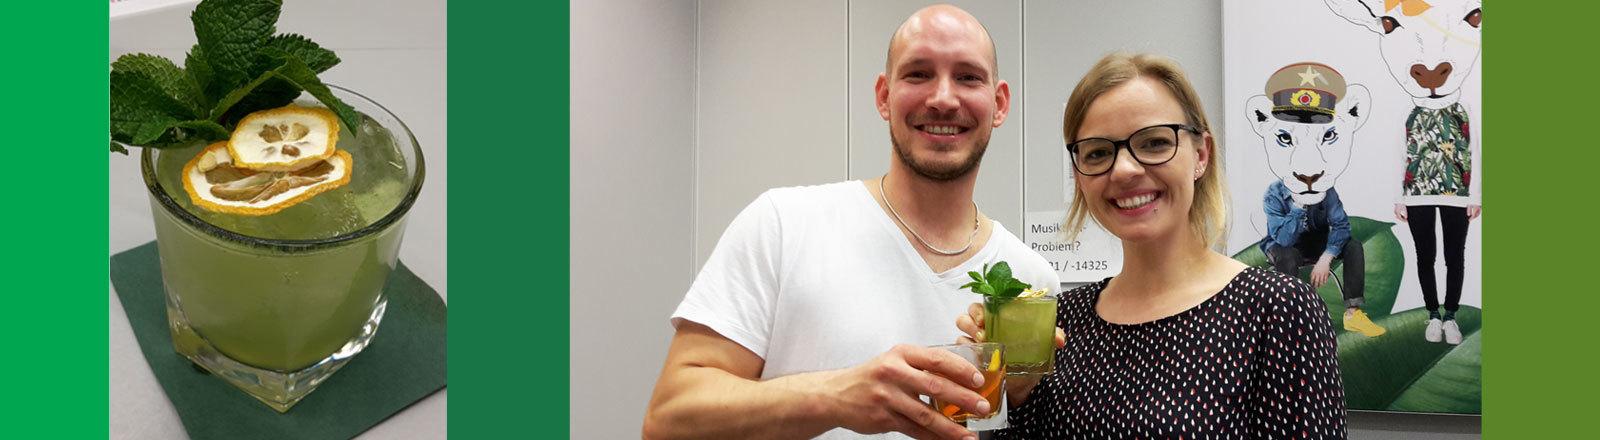 Cocktailmixer Felix Engels und Moderatorin Jenni Gärtner